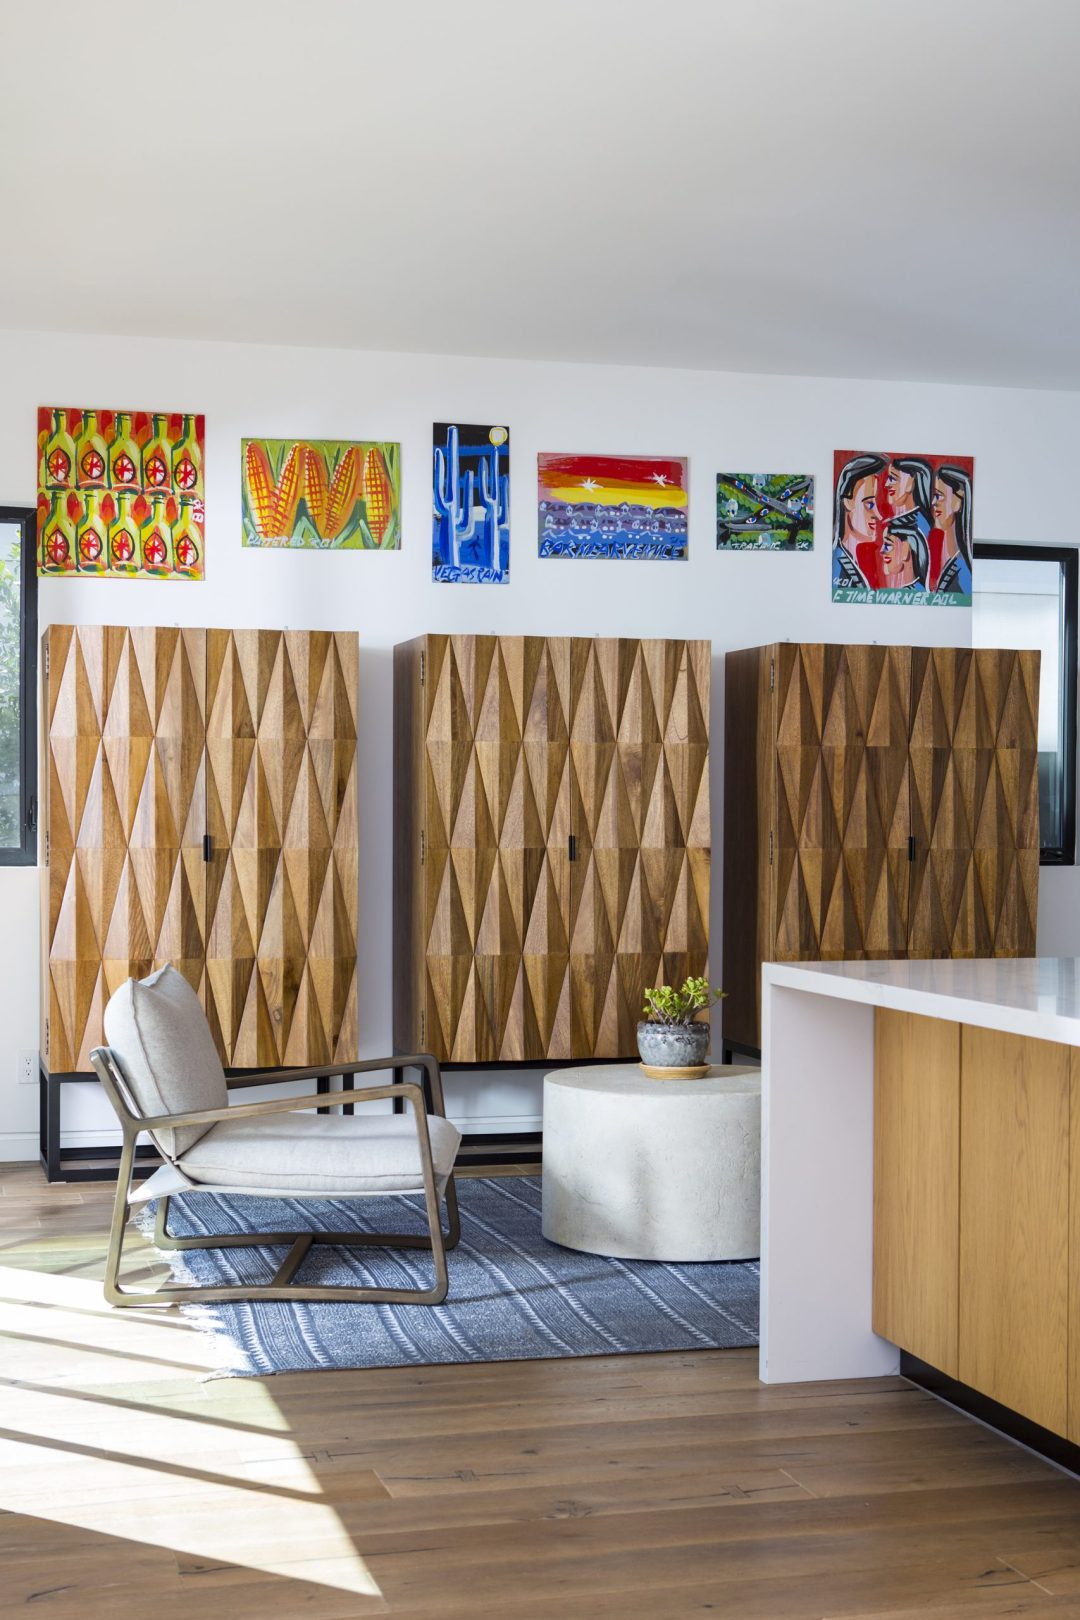 Creative Multi-purpose Room Ideas